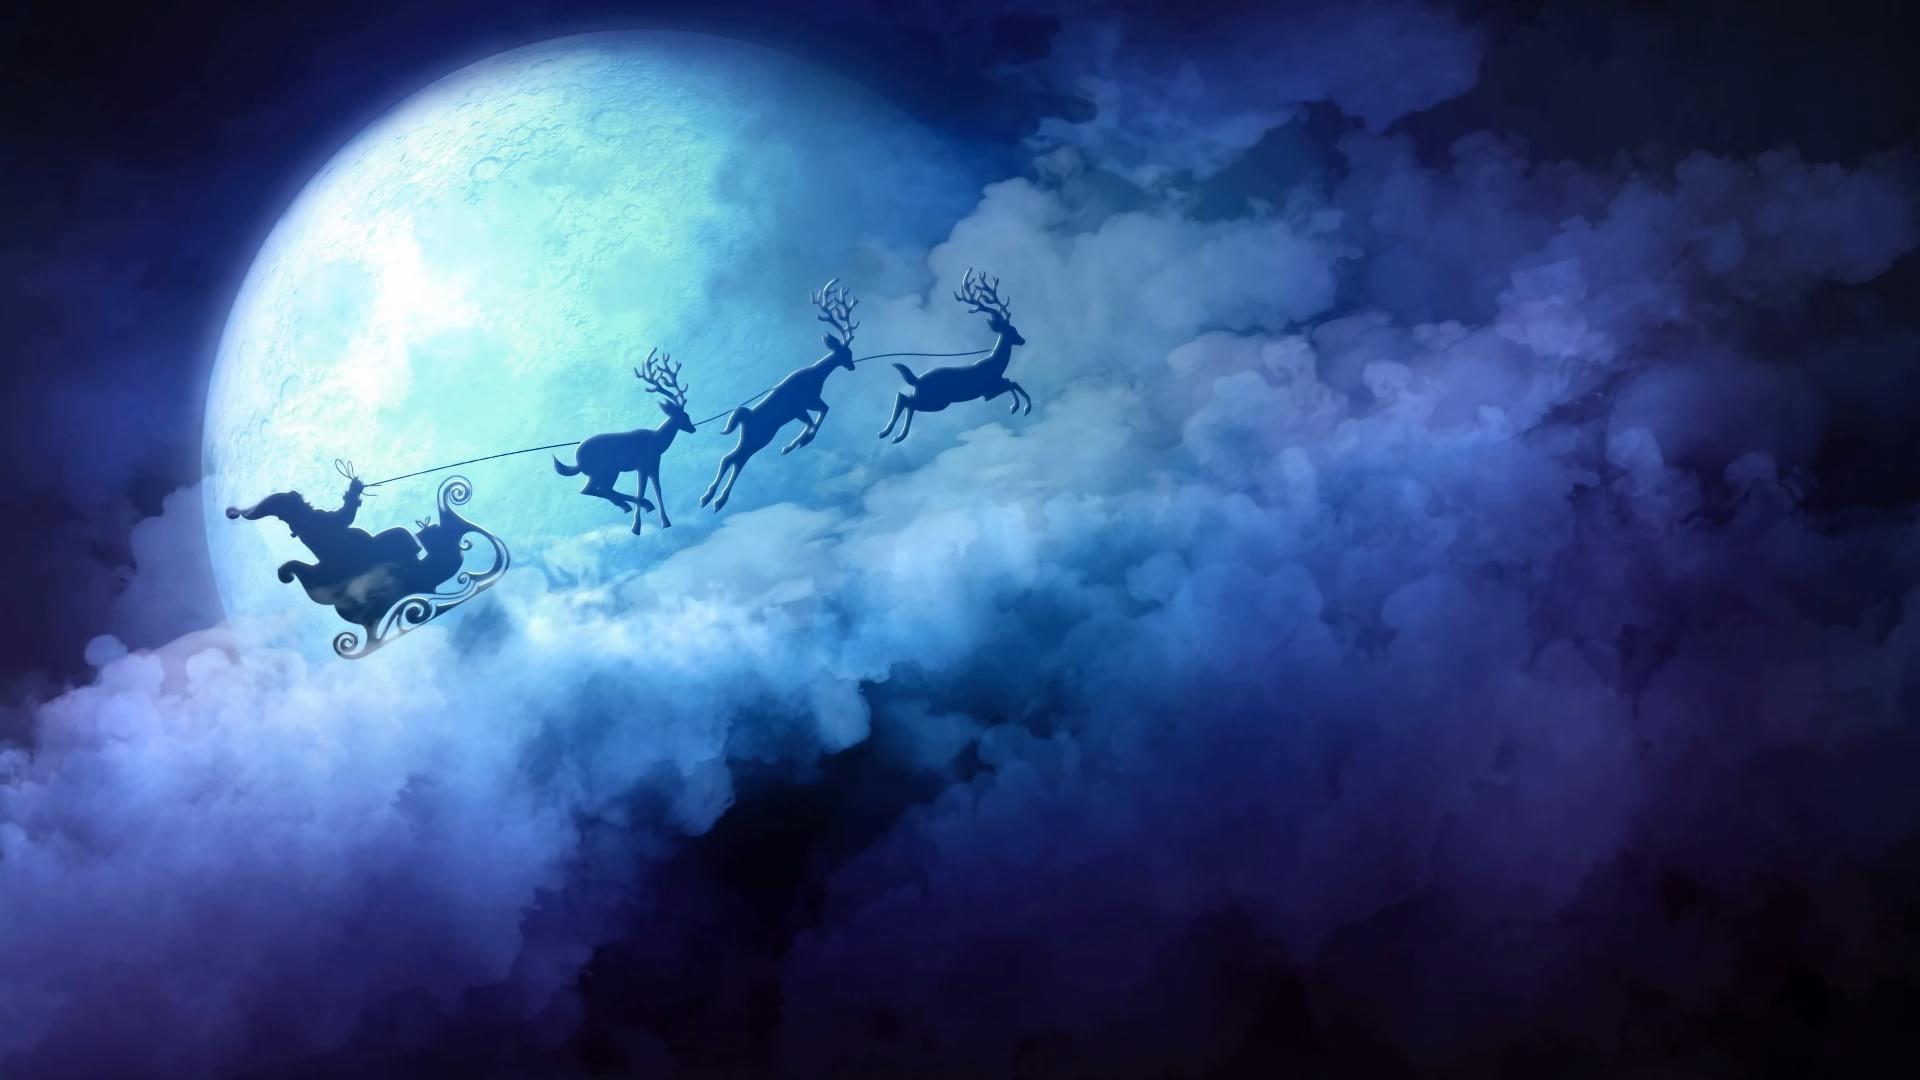 Nightmare Christmas Wallpaper Backgrounds